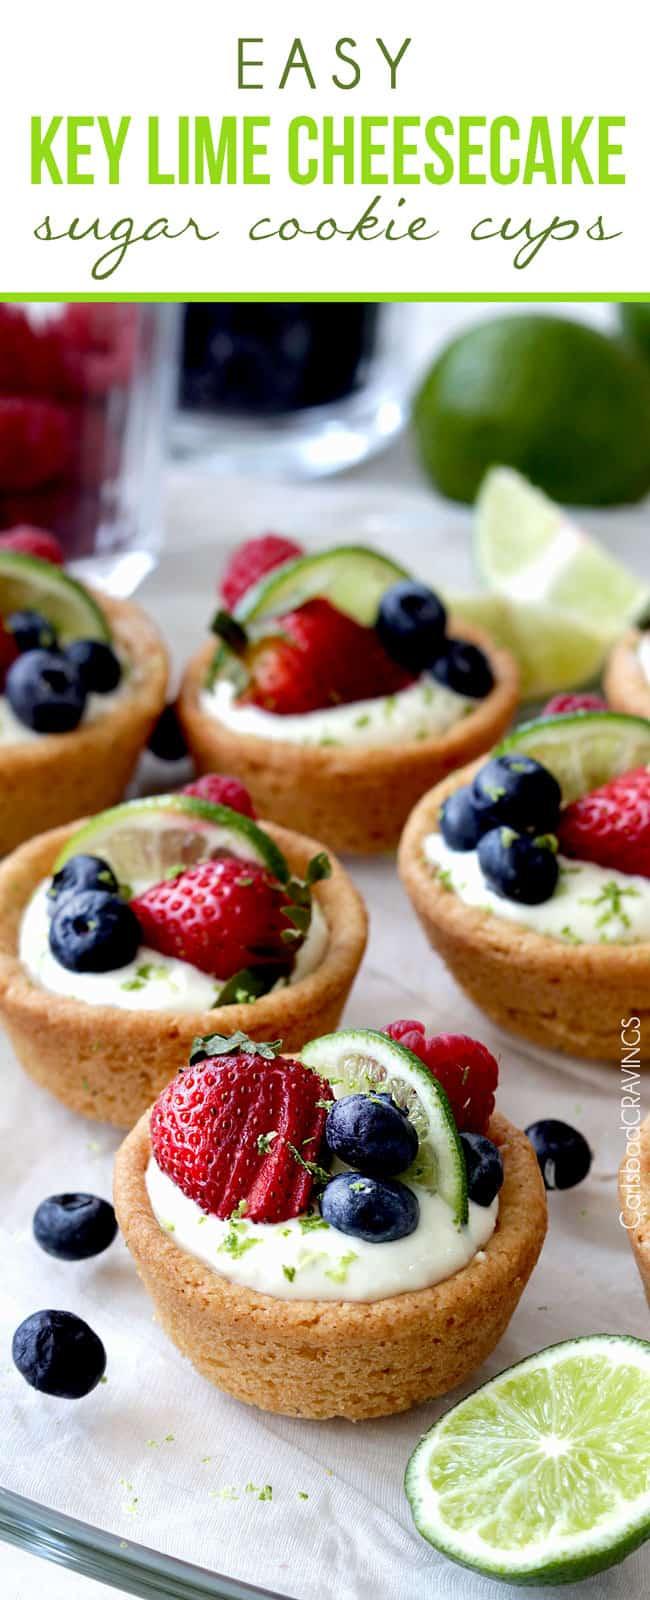 Key-Lime-Cheesecake-Sugar-Cookie-cups-main2